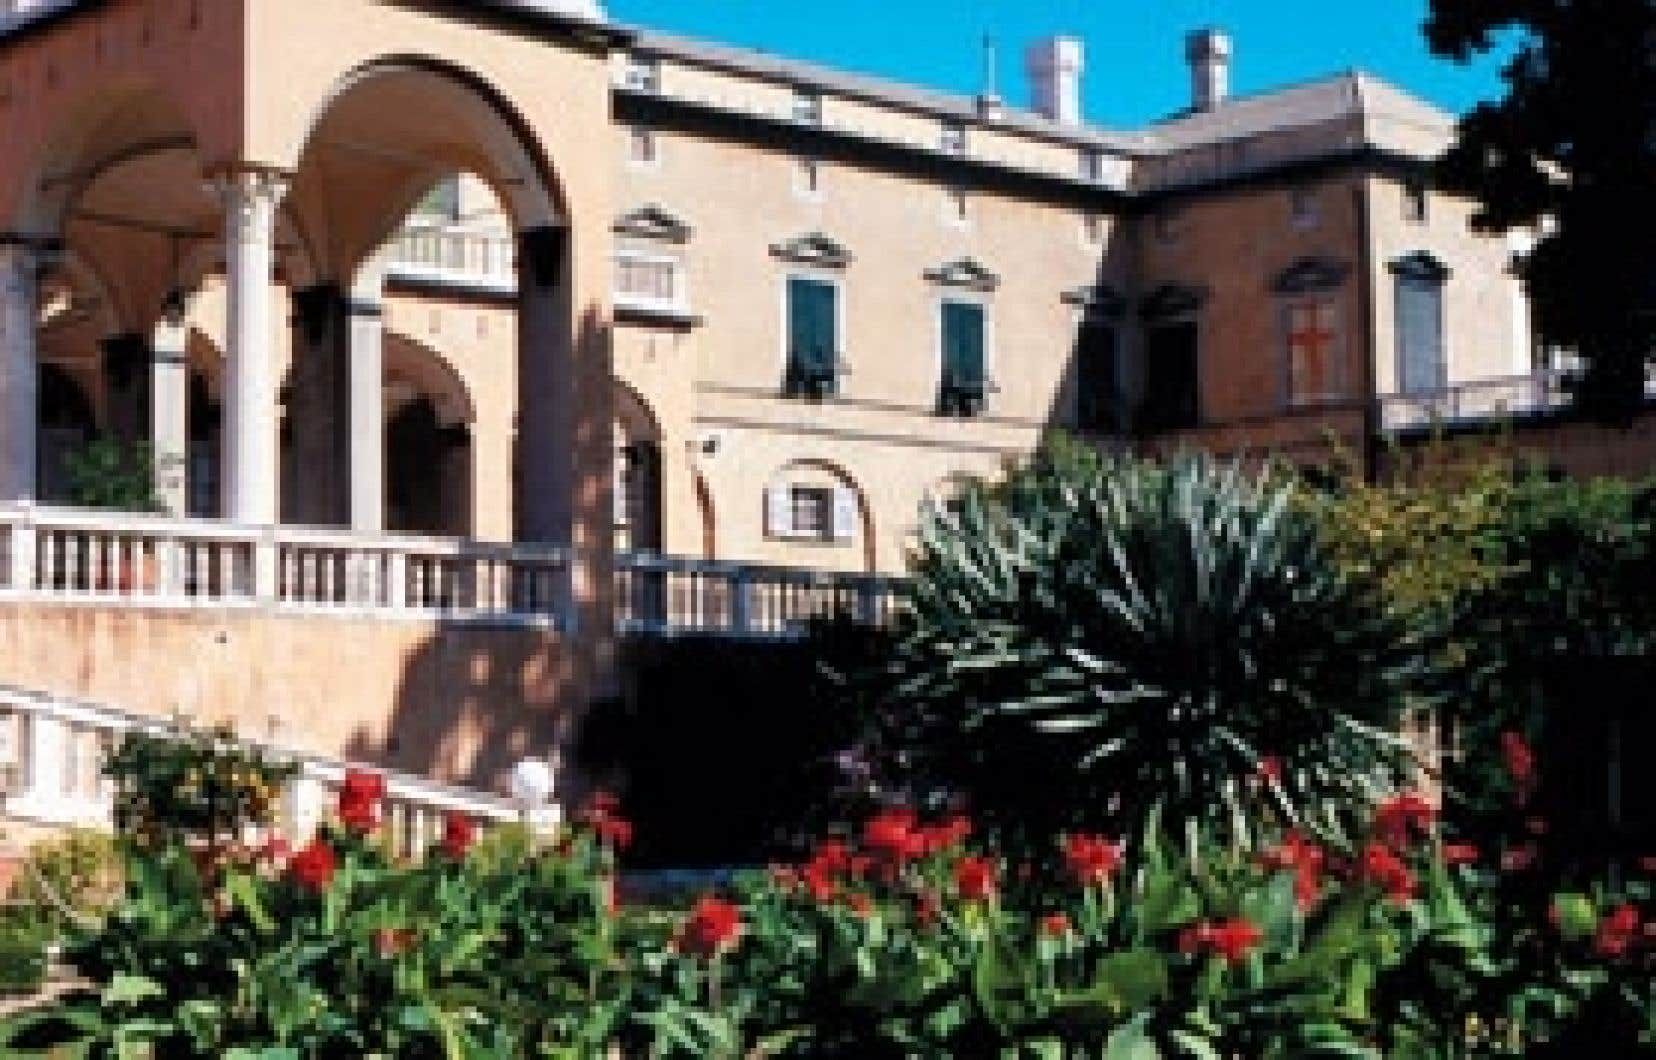 L'énorme villa de campagne le Palazzo del Principe, à Gênes.